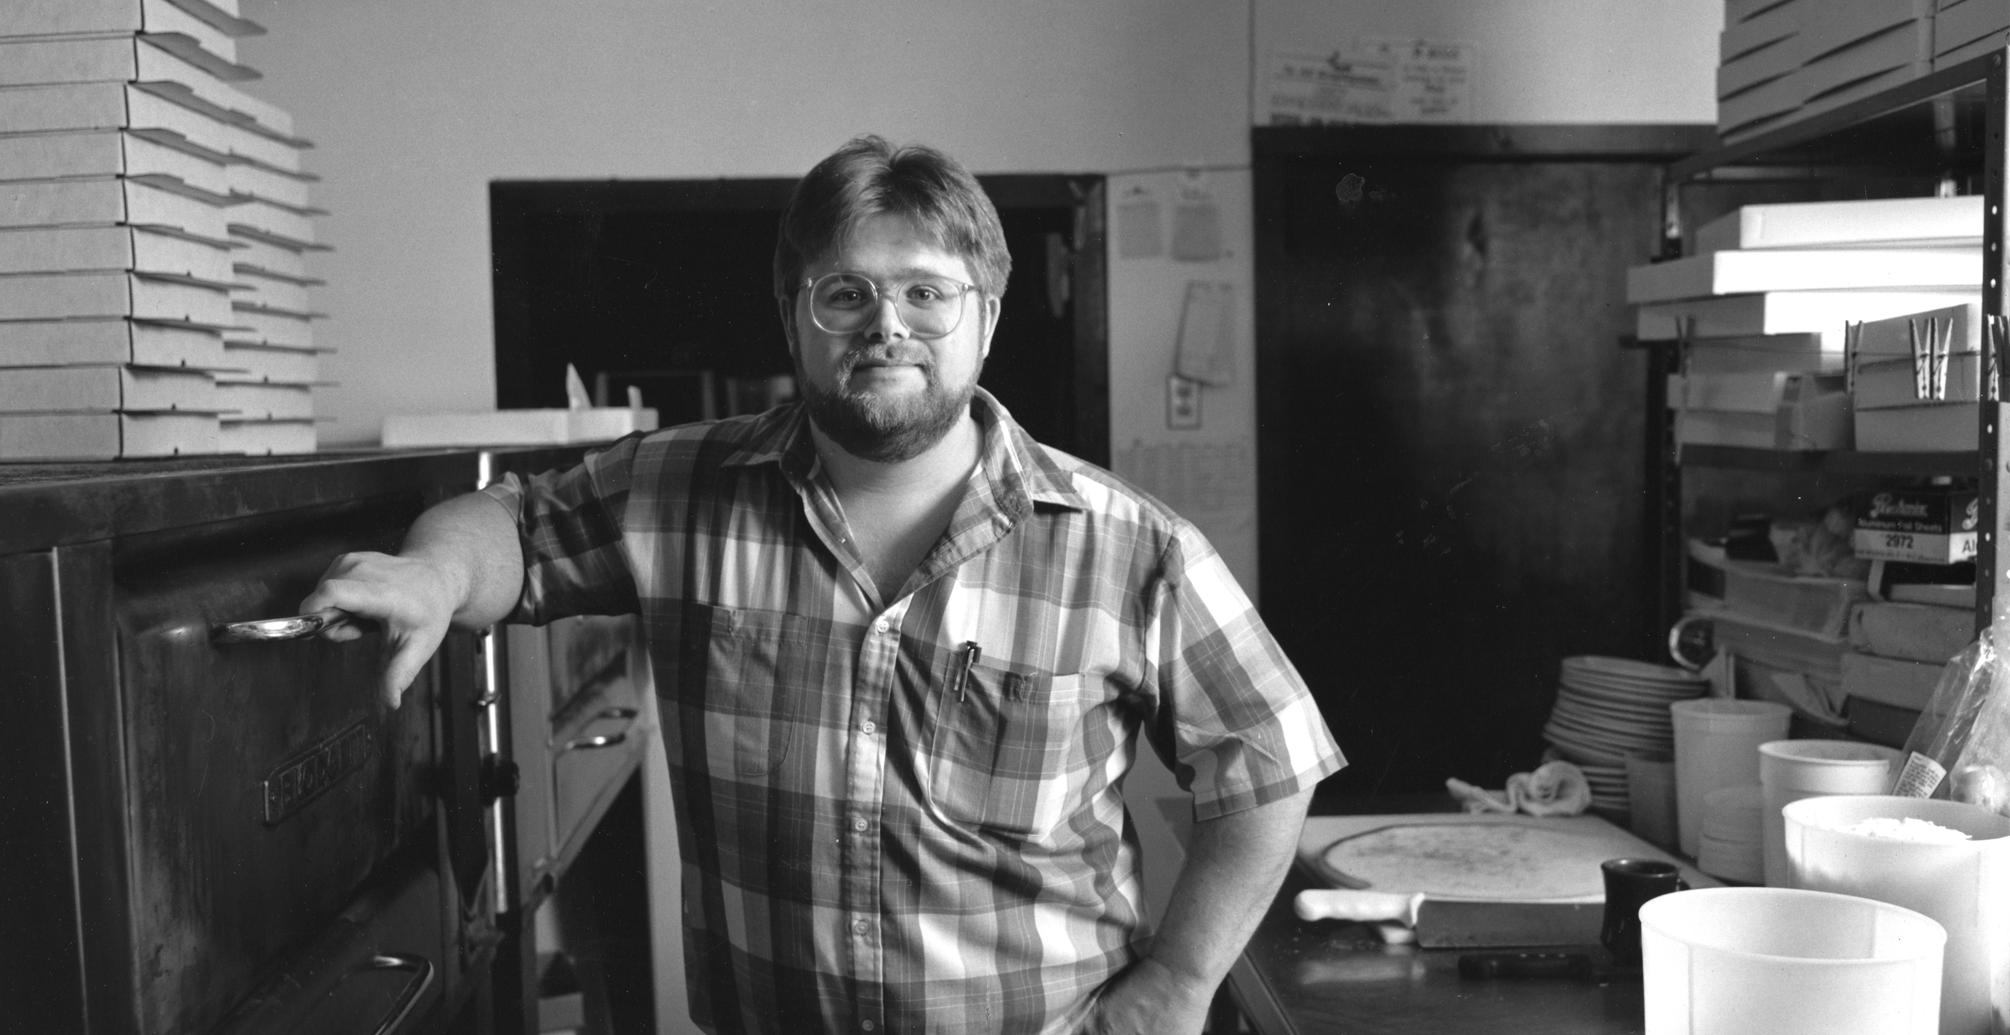 Lambert033-Jim-West-1989-website-slide1